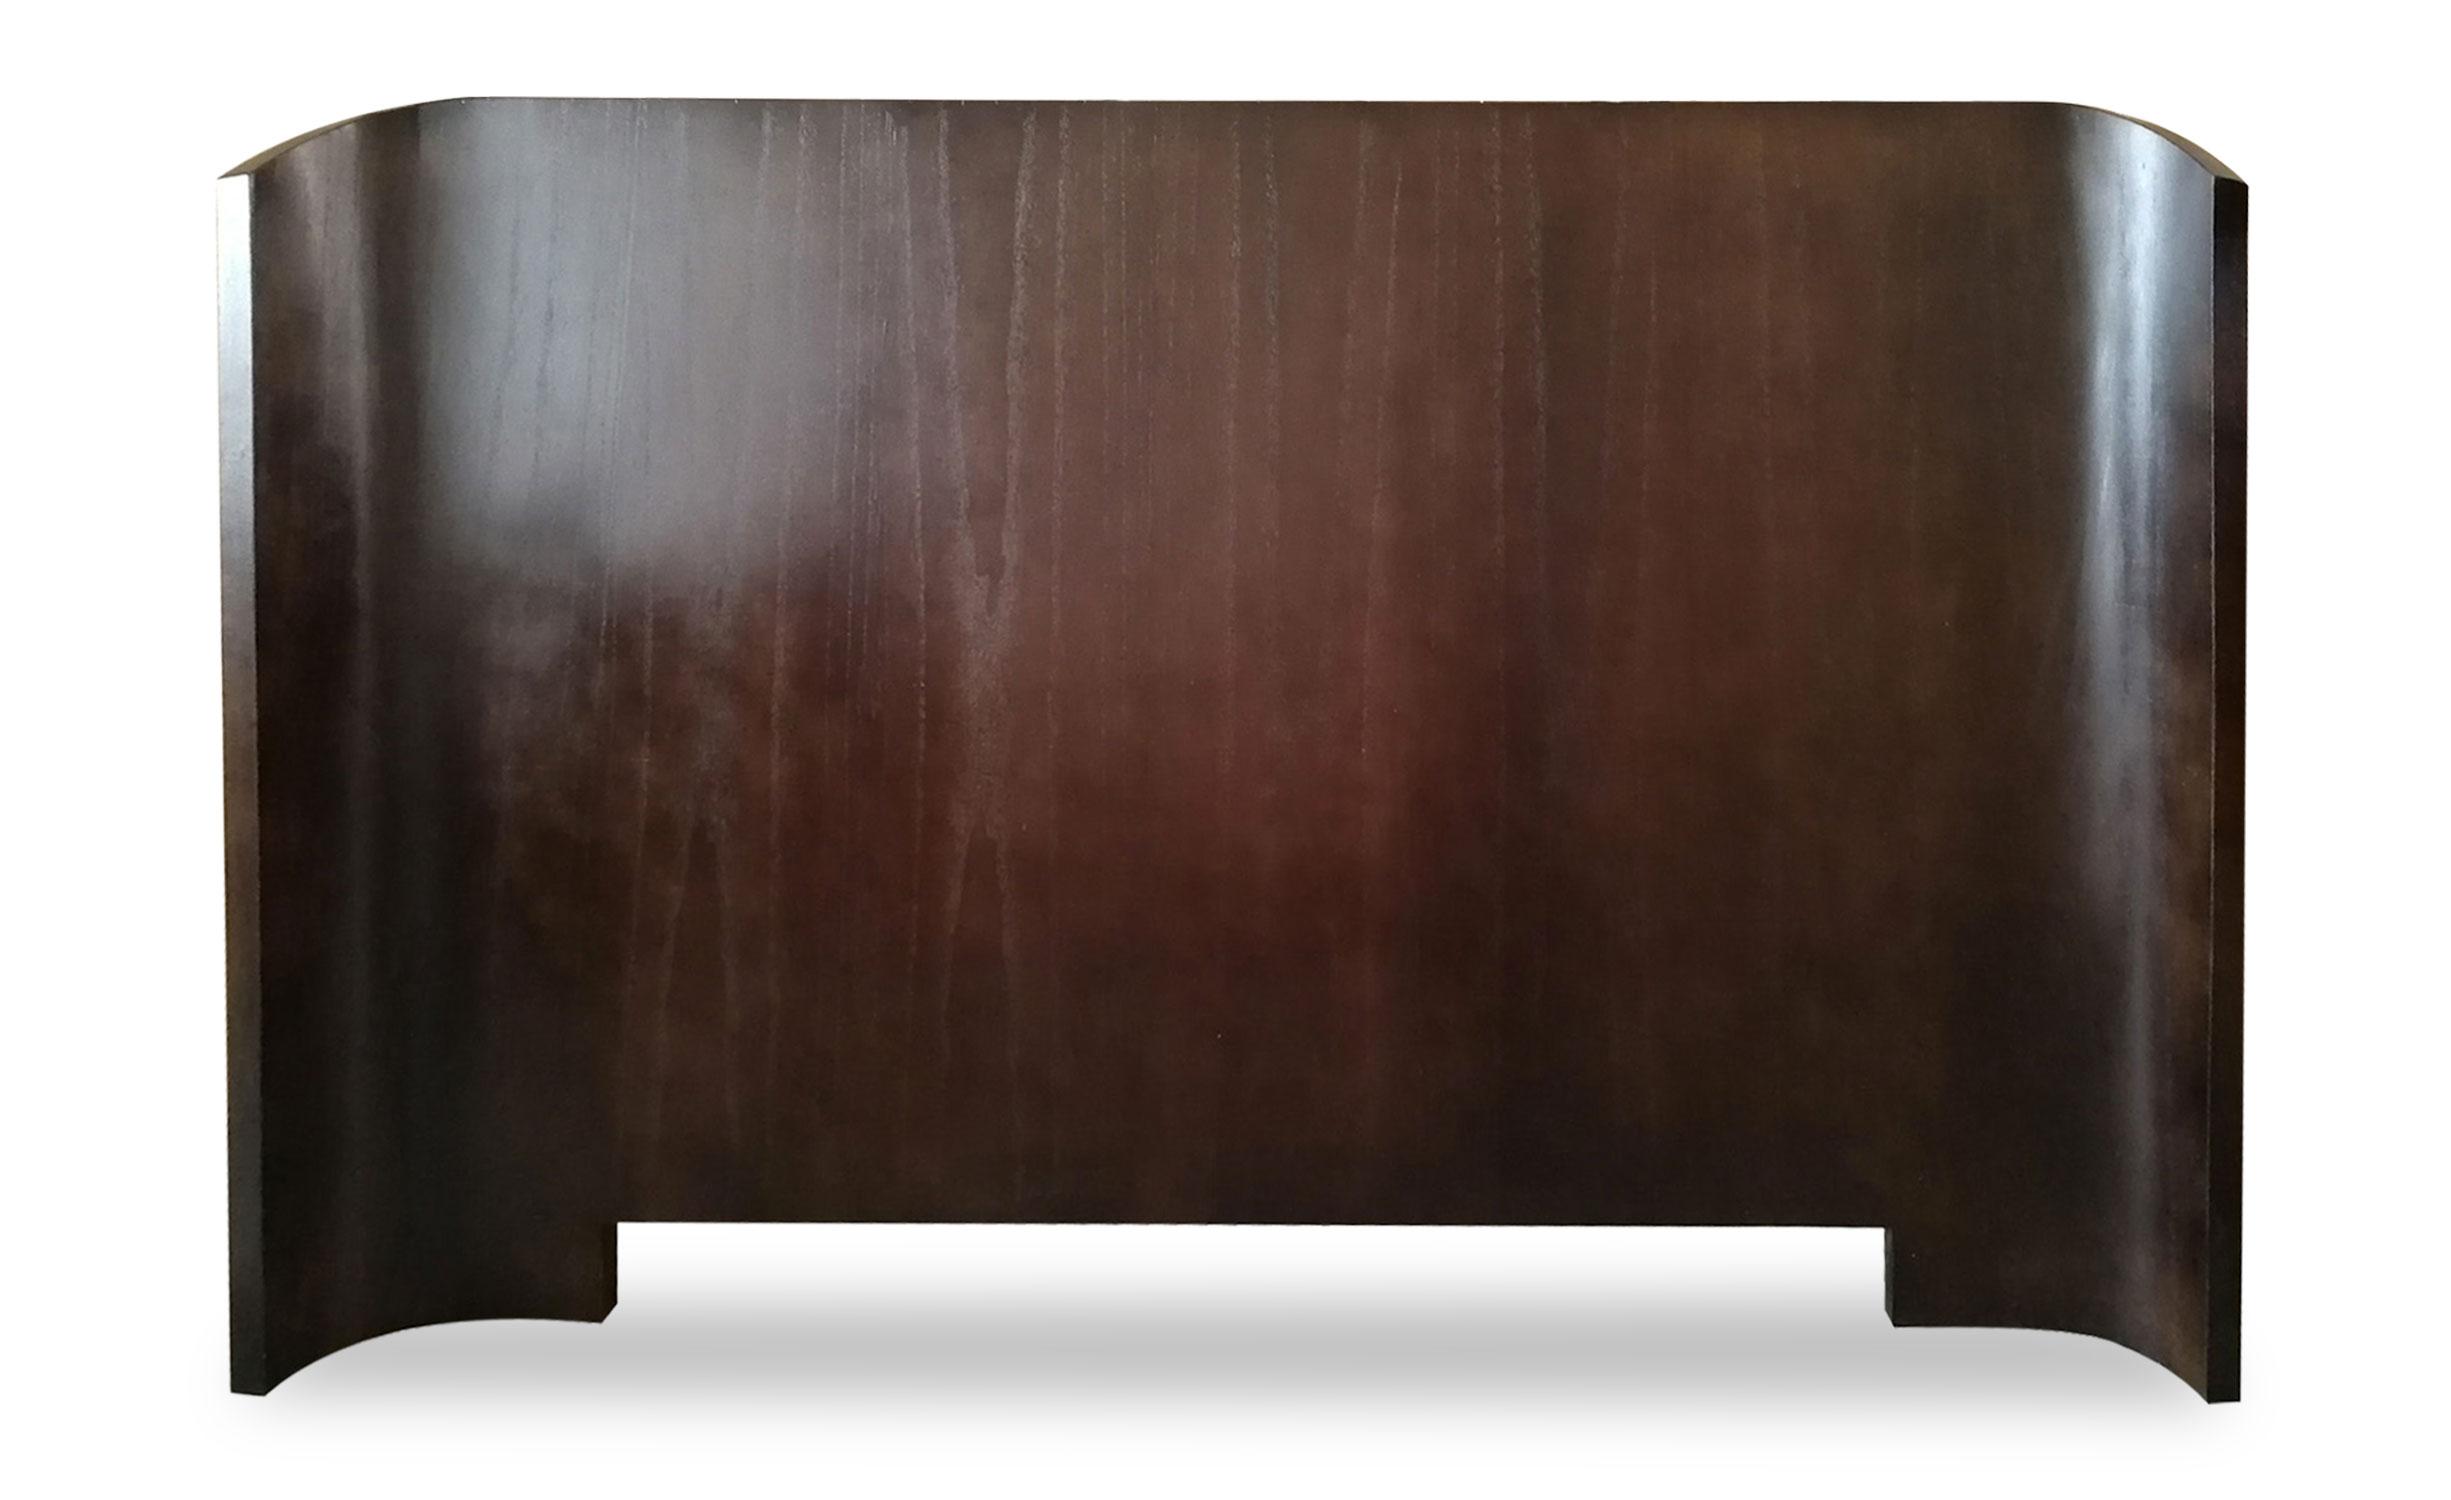 Mahuva hoofdeinde 160 cm Donker hout